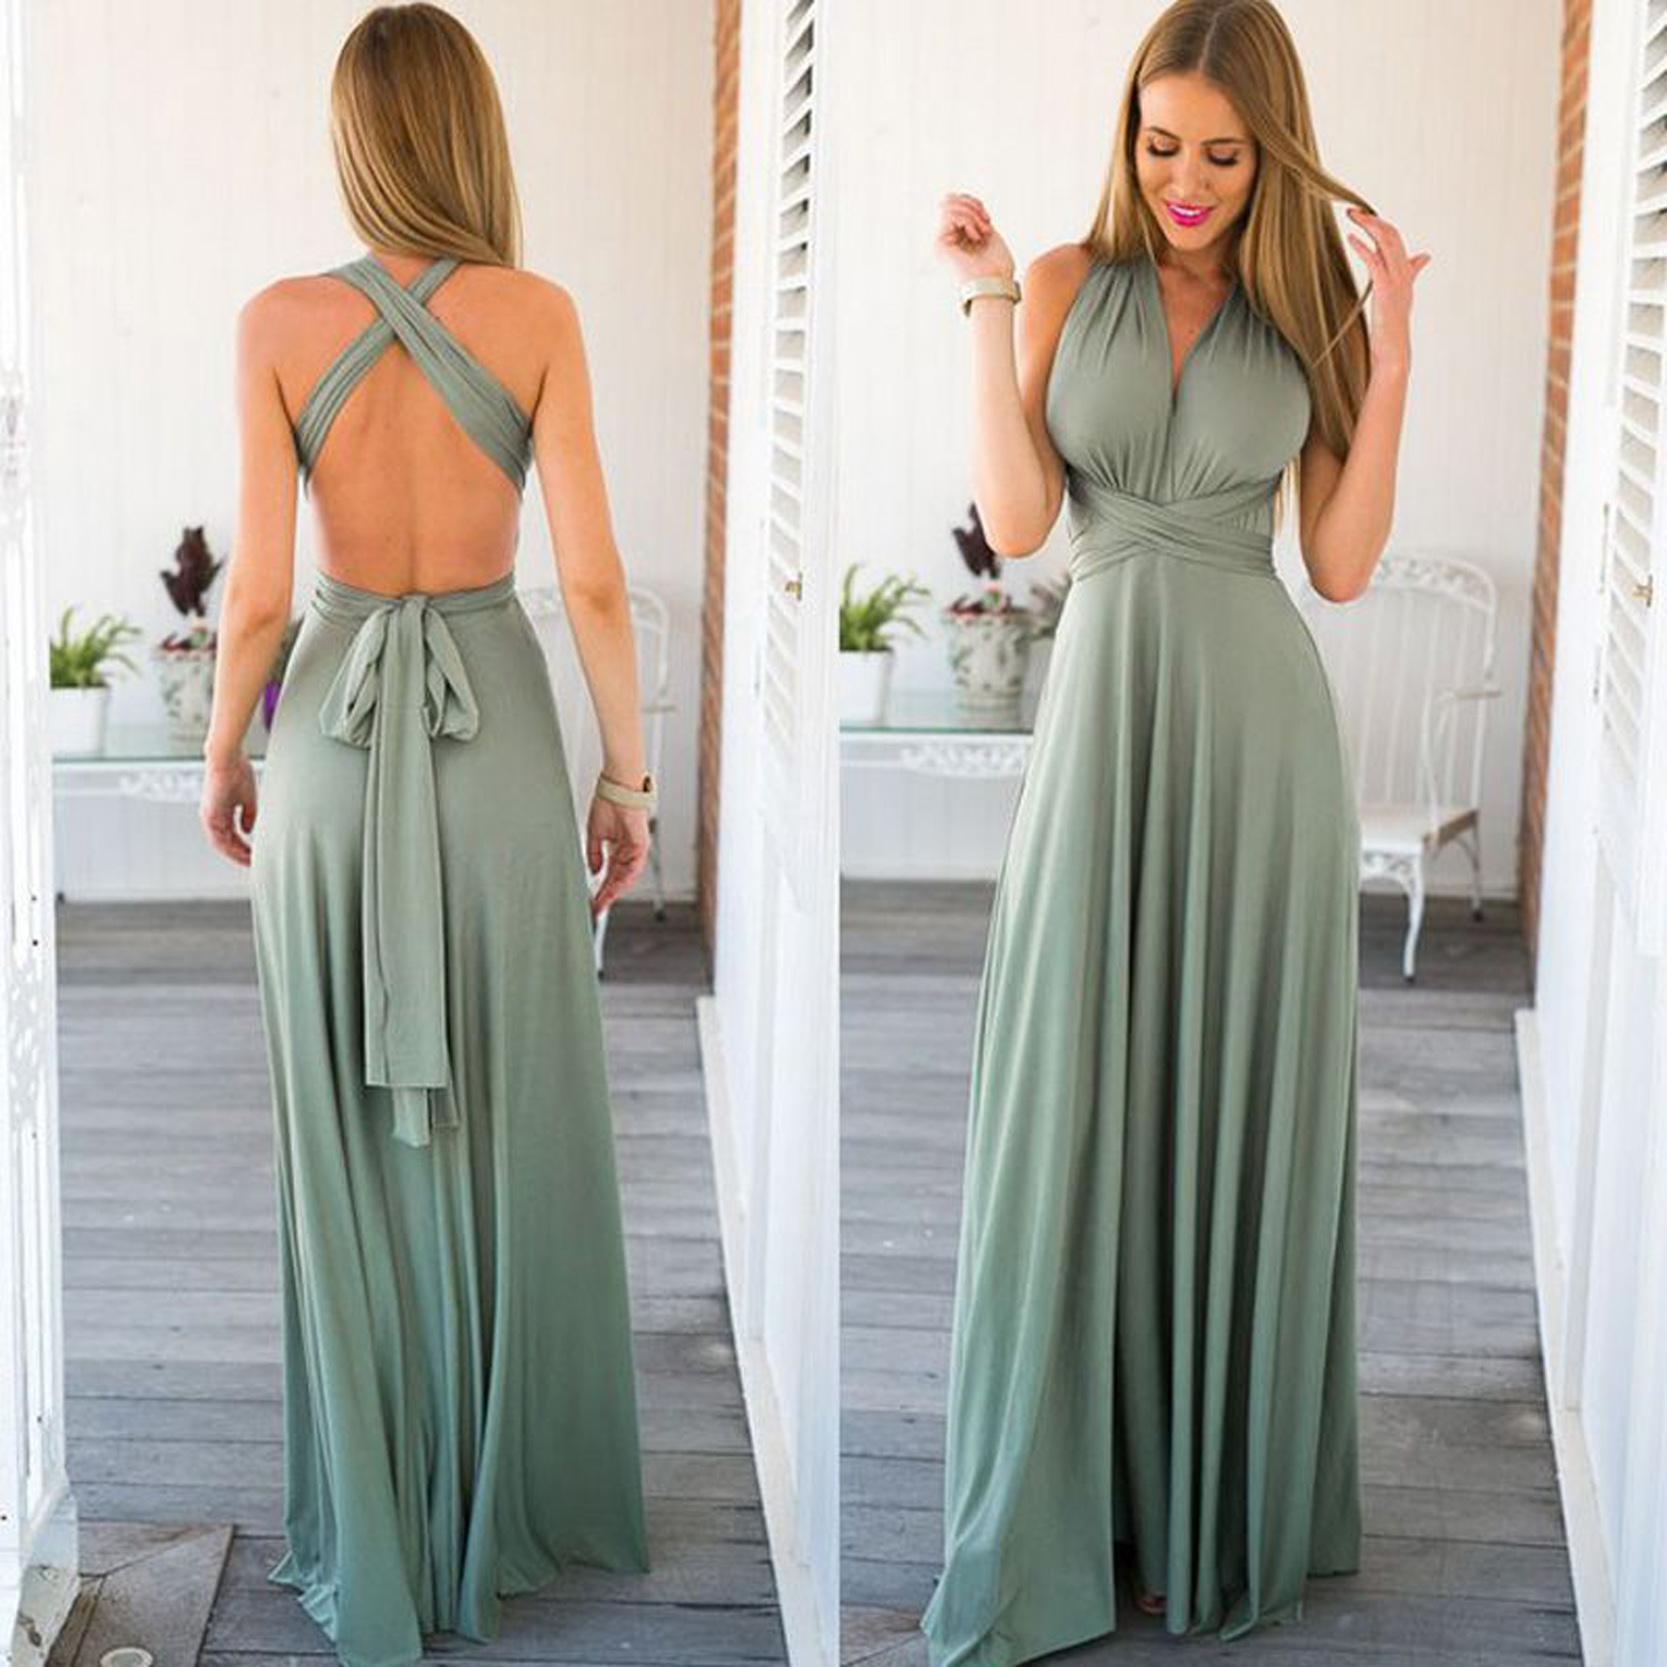 2020 New Designed Sleeveless Deep-v Neck Sexy Womens Party Evening Weddings Long Bridesmaid Dresses